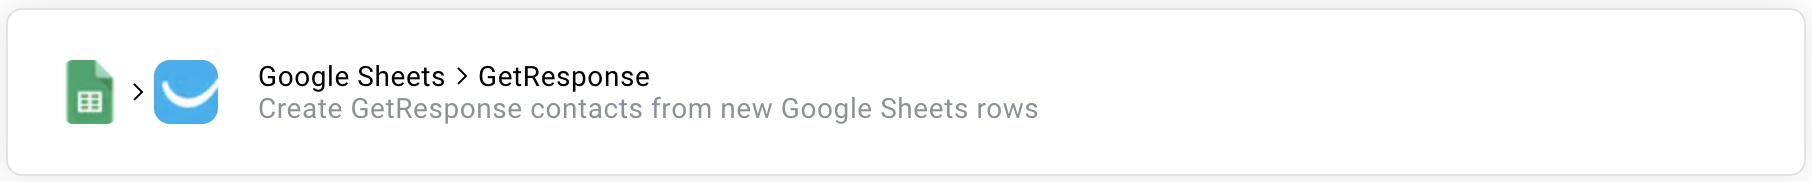 google sheets getresponse zap.